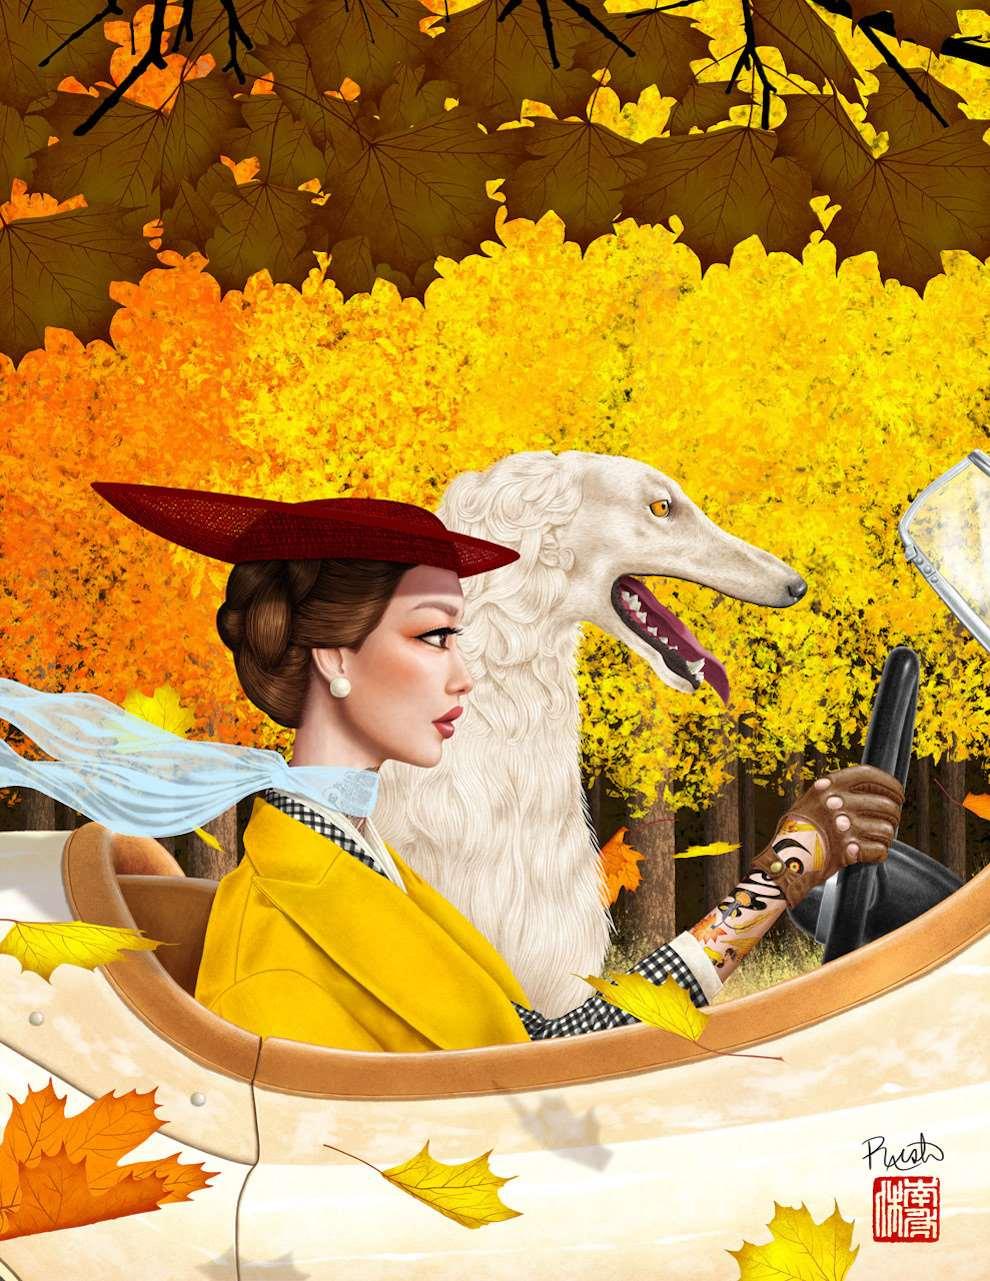 Jason Raish, Autumn high fashion woman with borzoi dog driving a vintage car